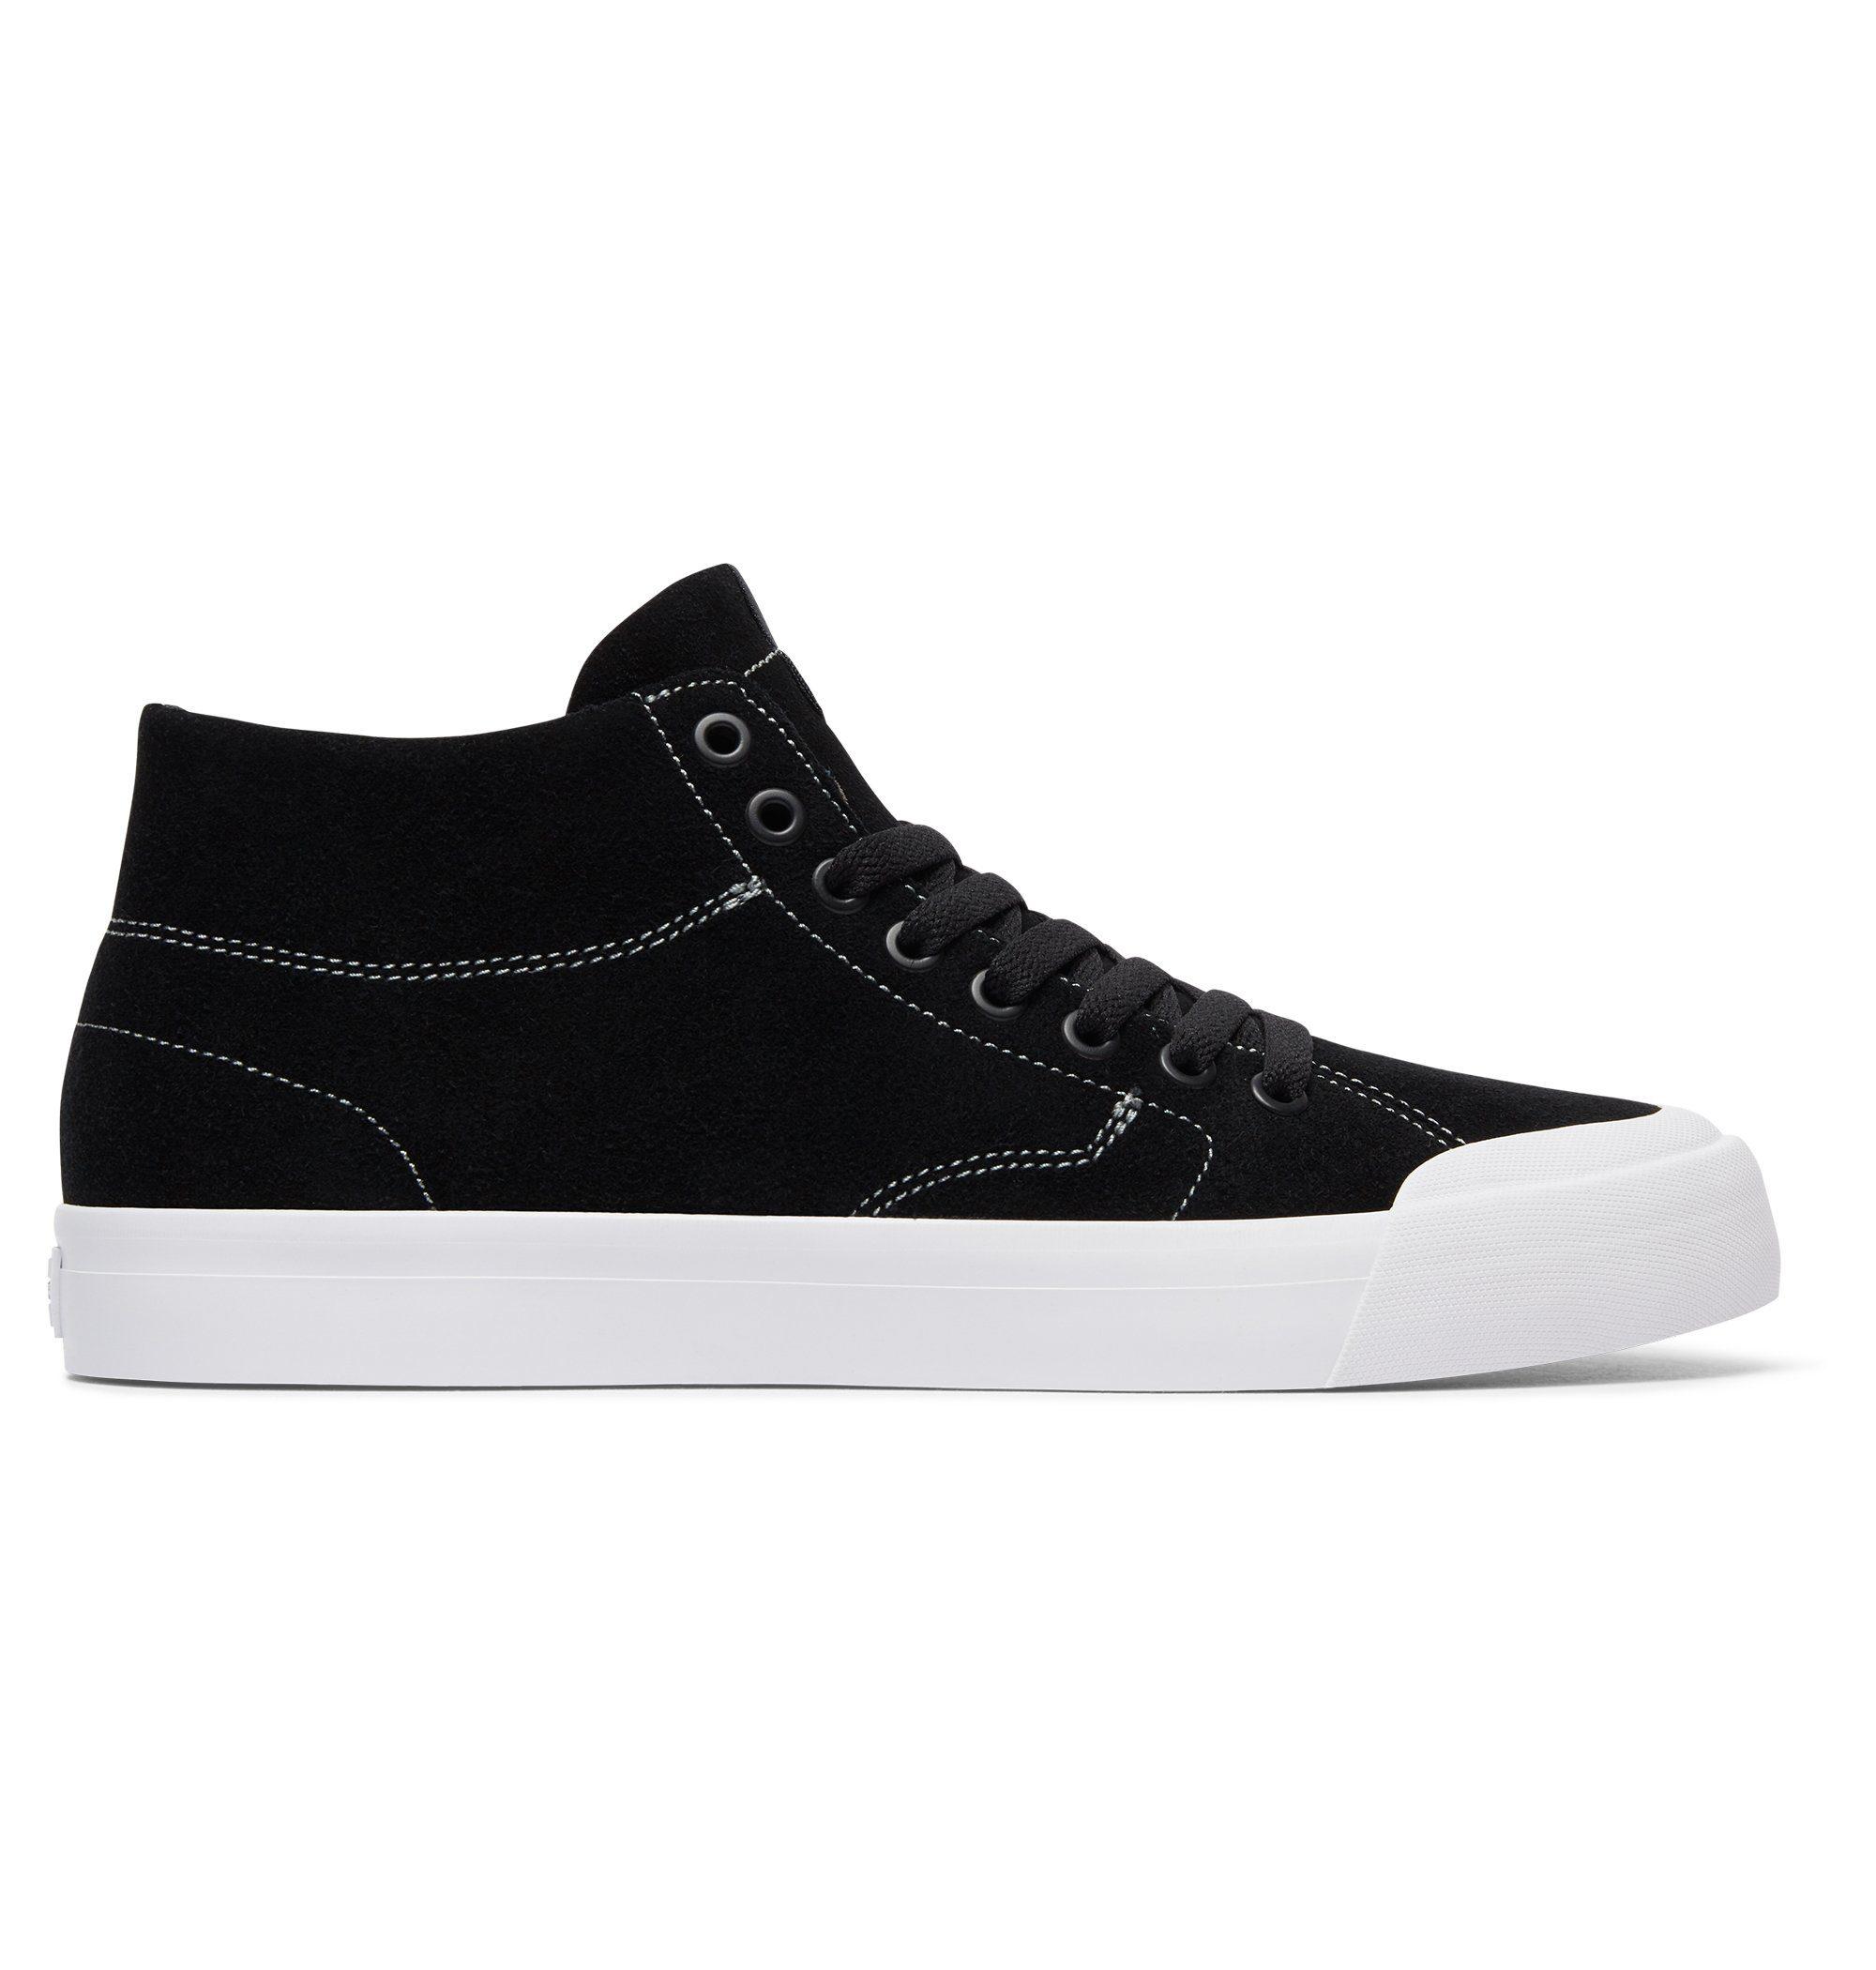 Chaussures Dc Noir Chaussures Crise 40 Hommes h6Llk0